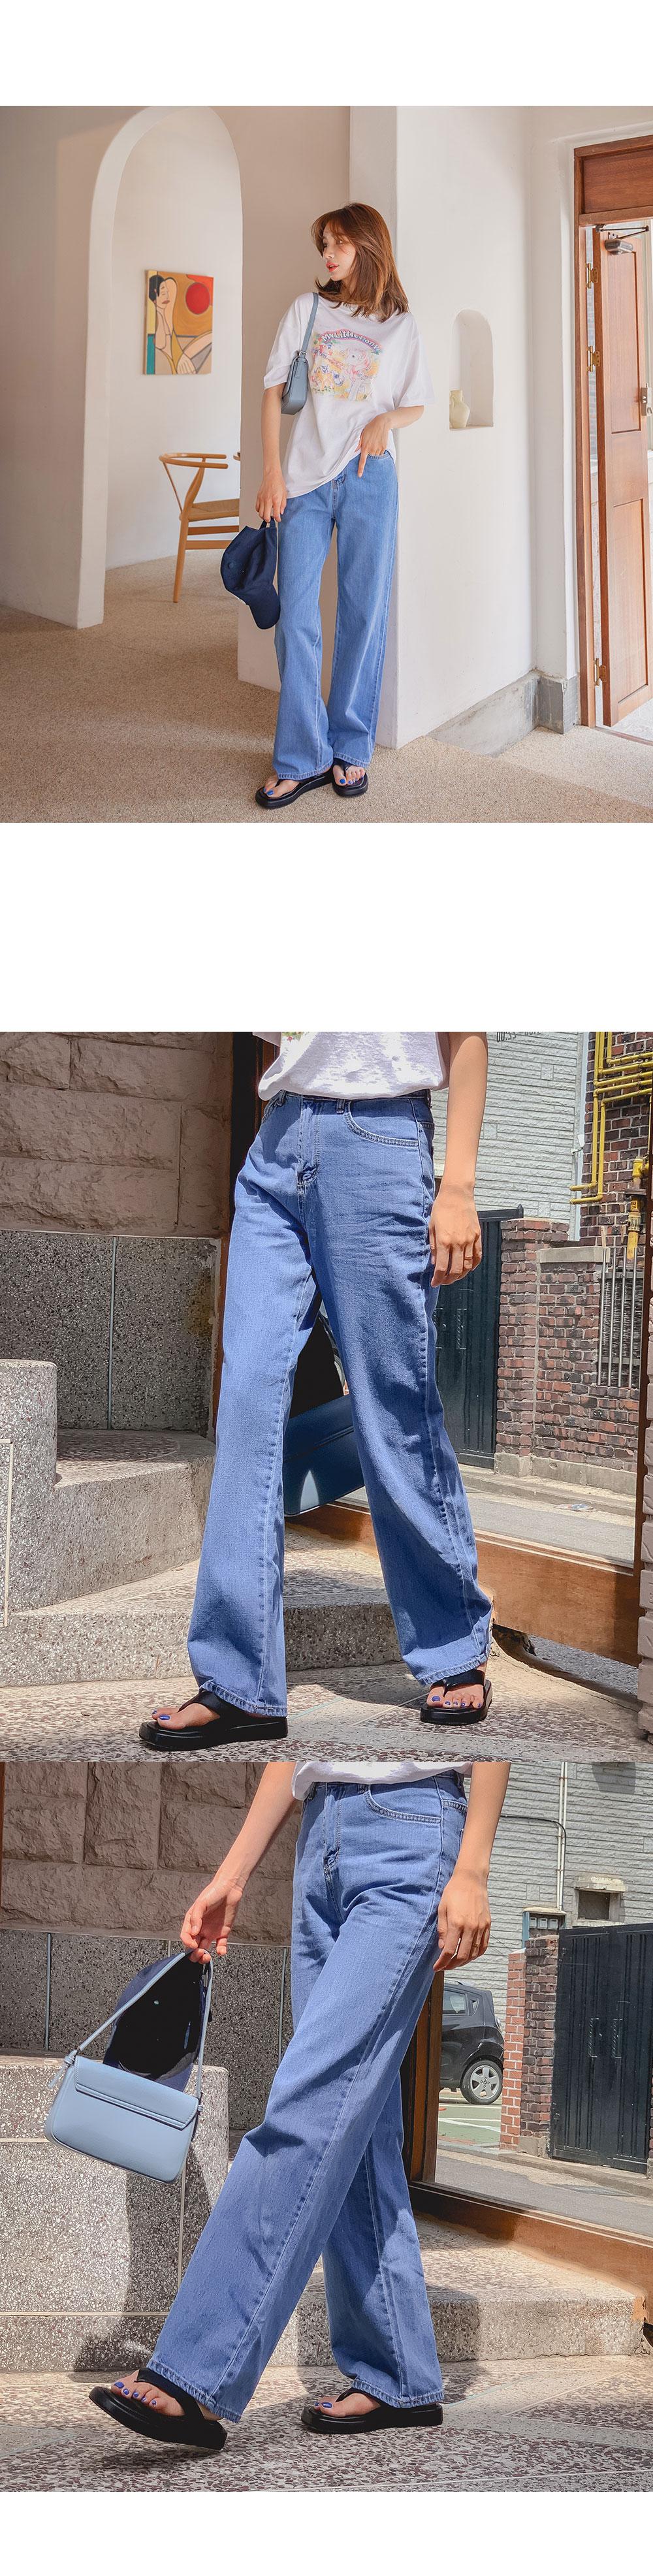 Hedges wide denim pants